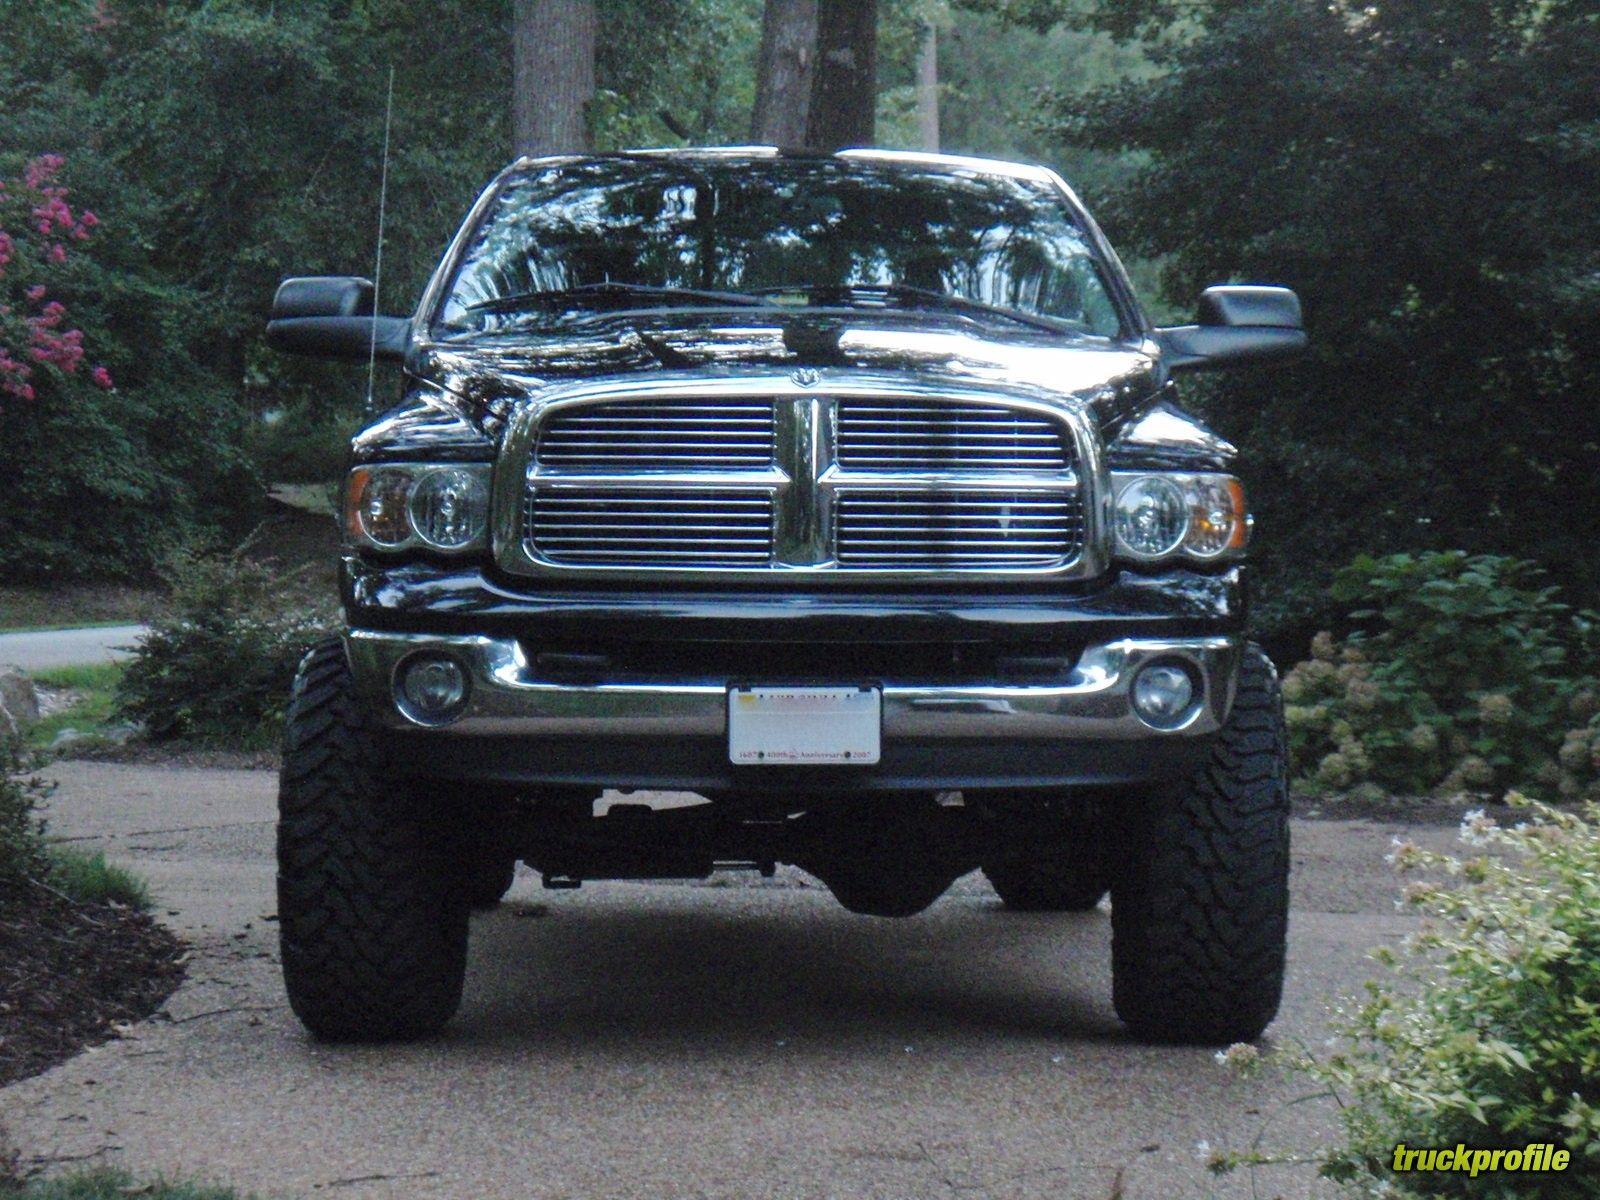 Dodge Ram Vs Ford F 150 And Chevy Silverado Comparison Tests Dodge Trucks Ram Dodge Ram Ram Trucks